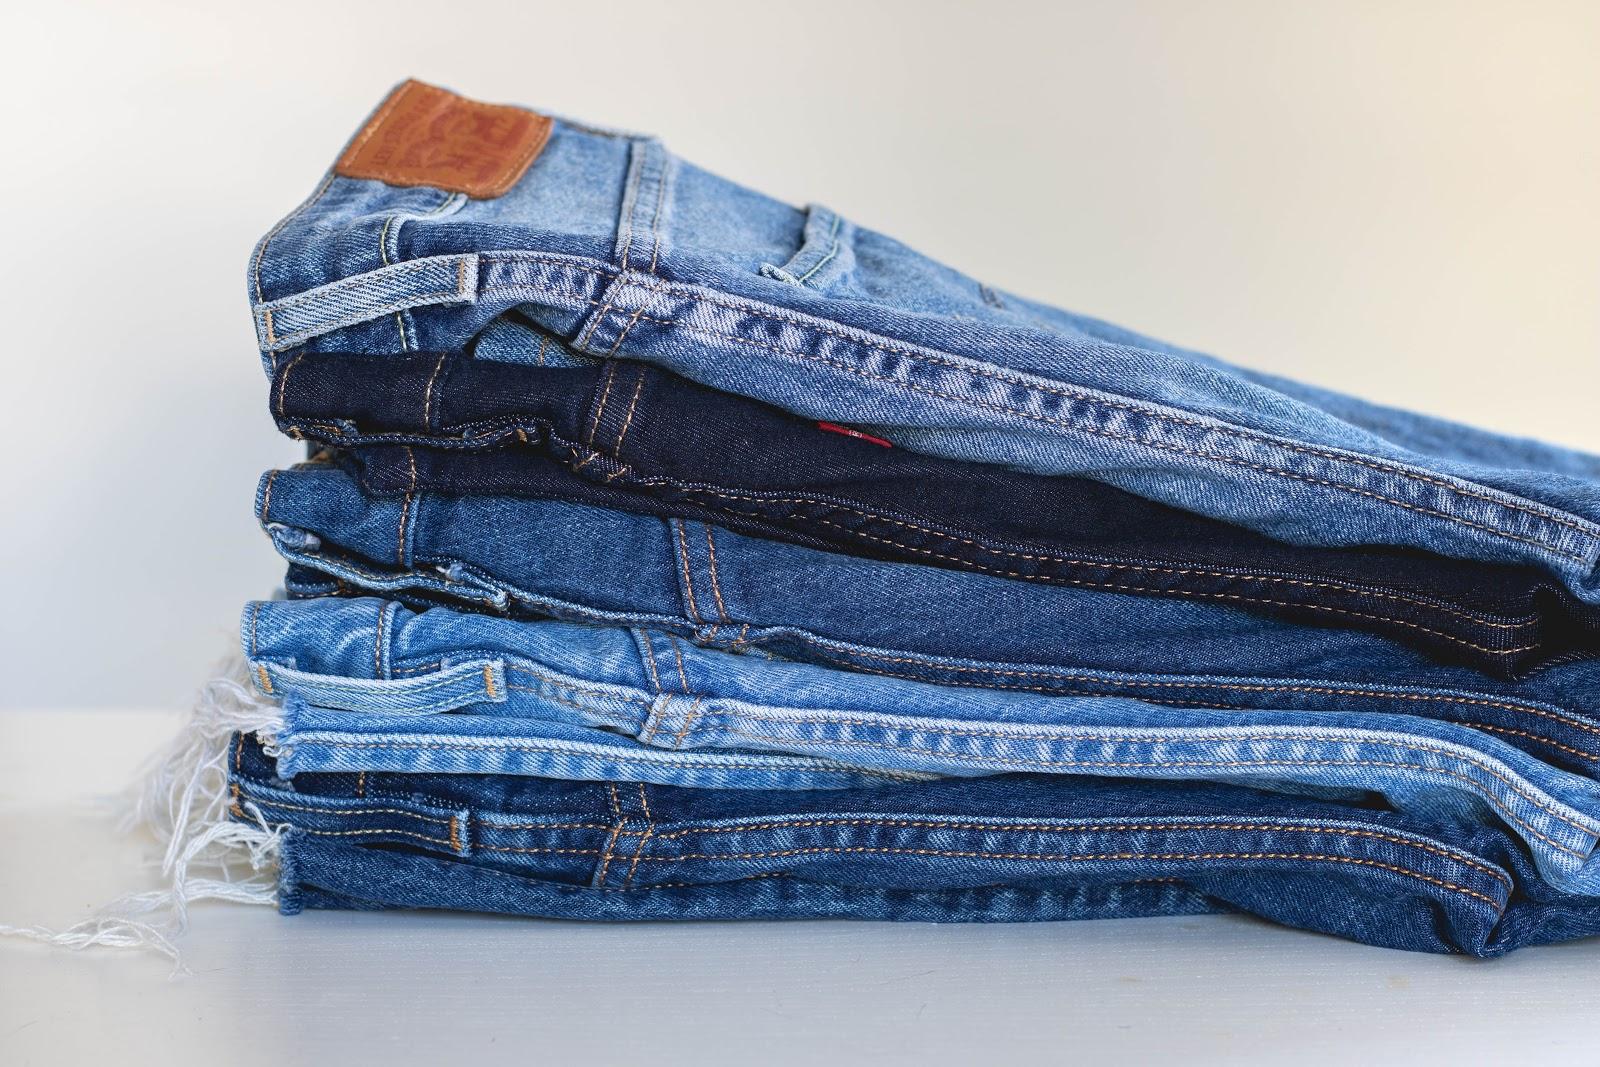 Pantalon en jeans pliés